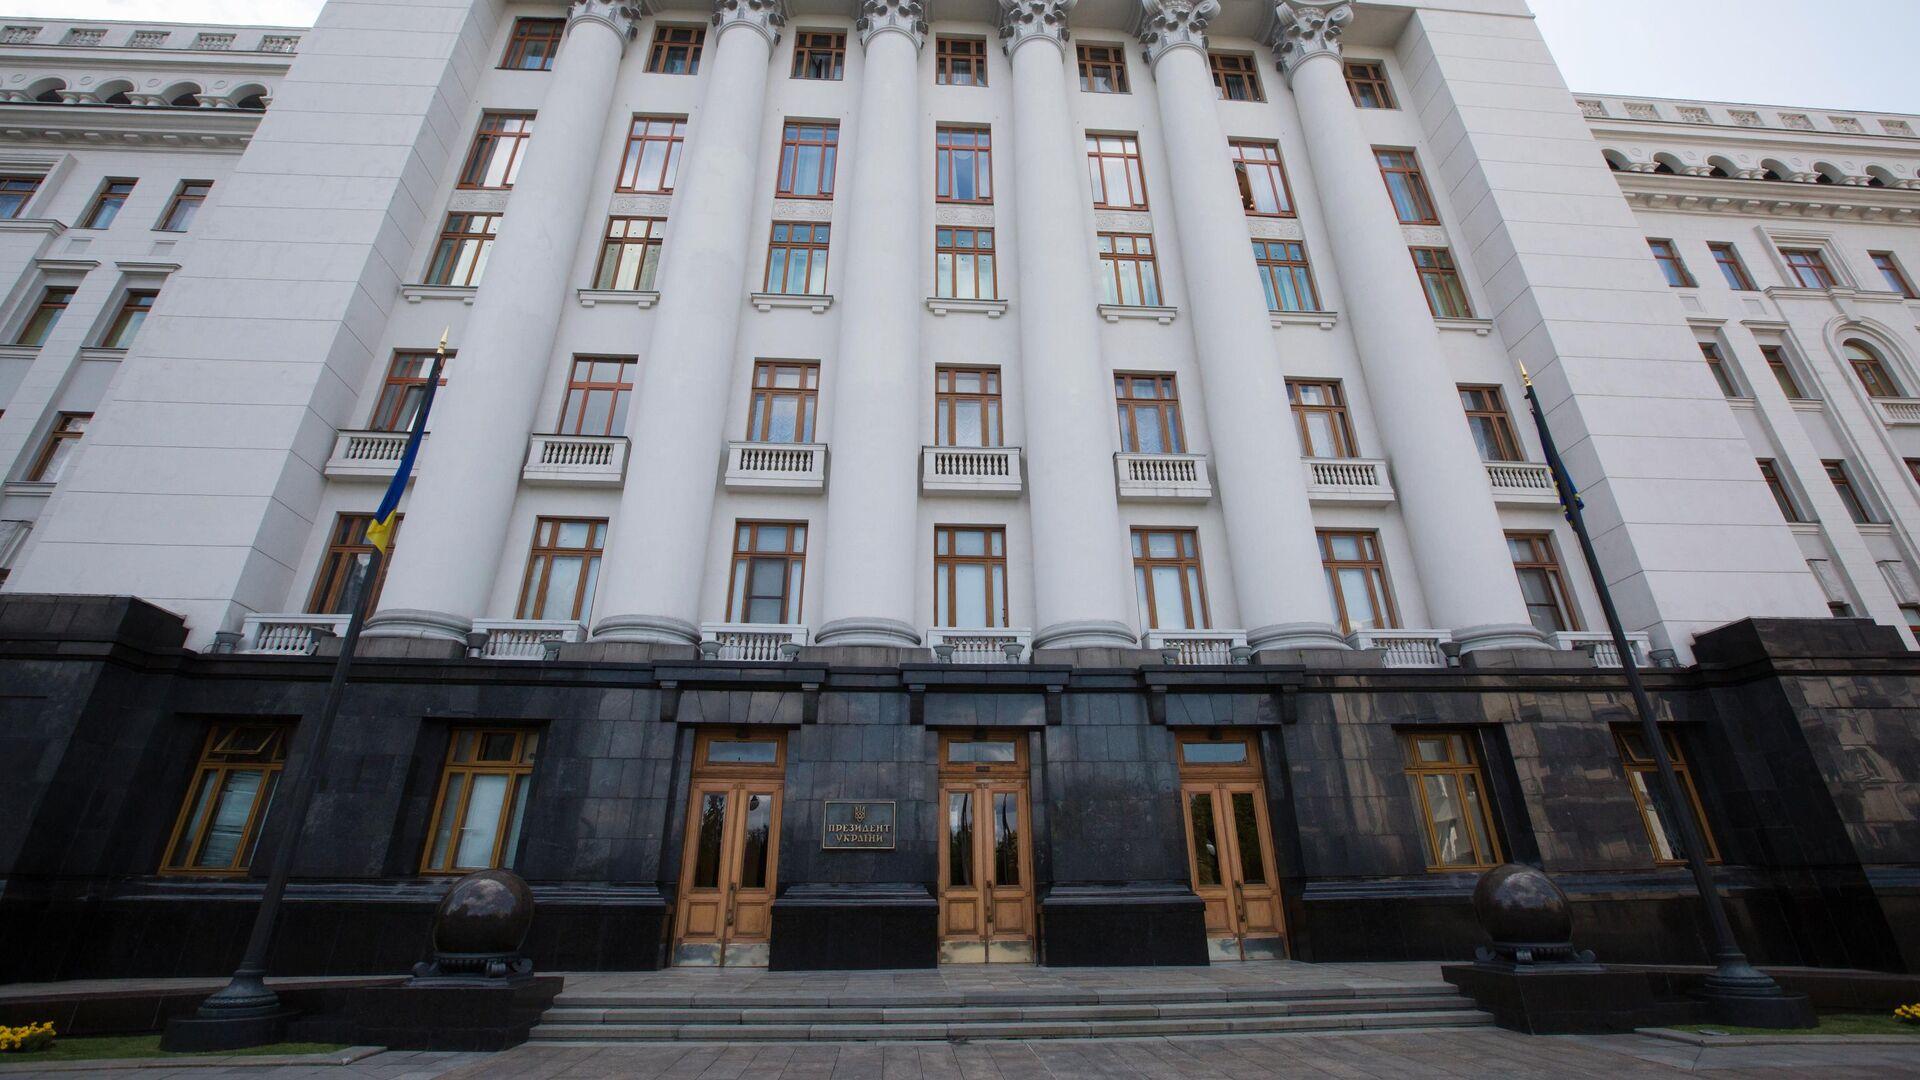 Здание администрации президента Украины - РИА Новости, 1920, 06.12.2020